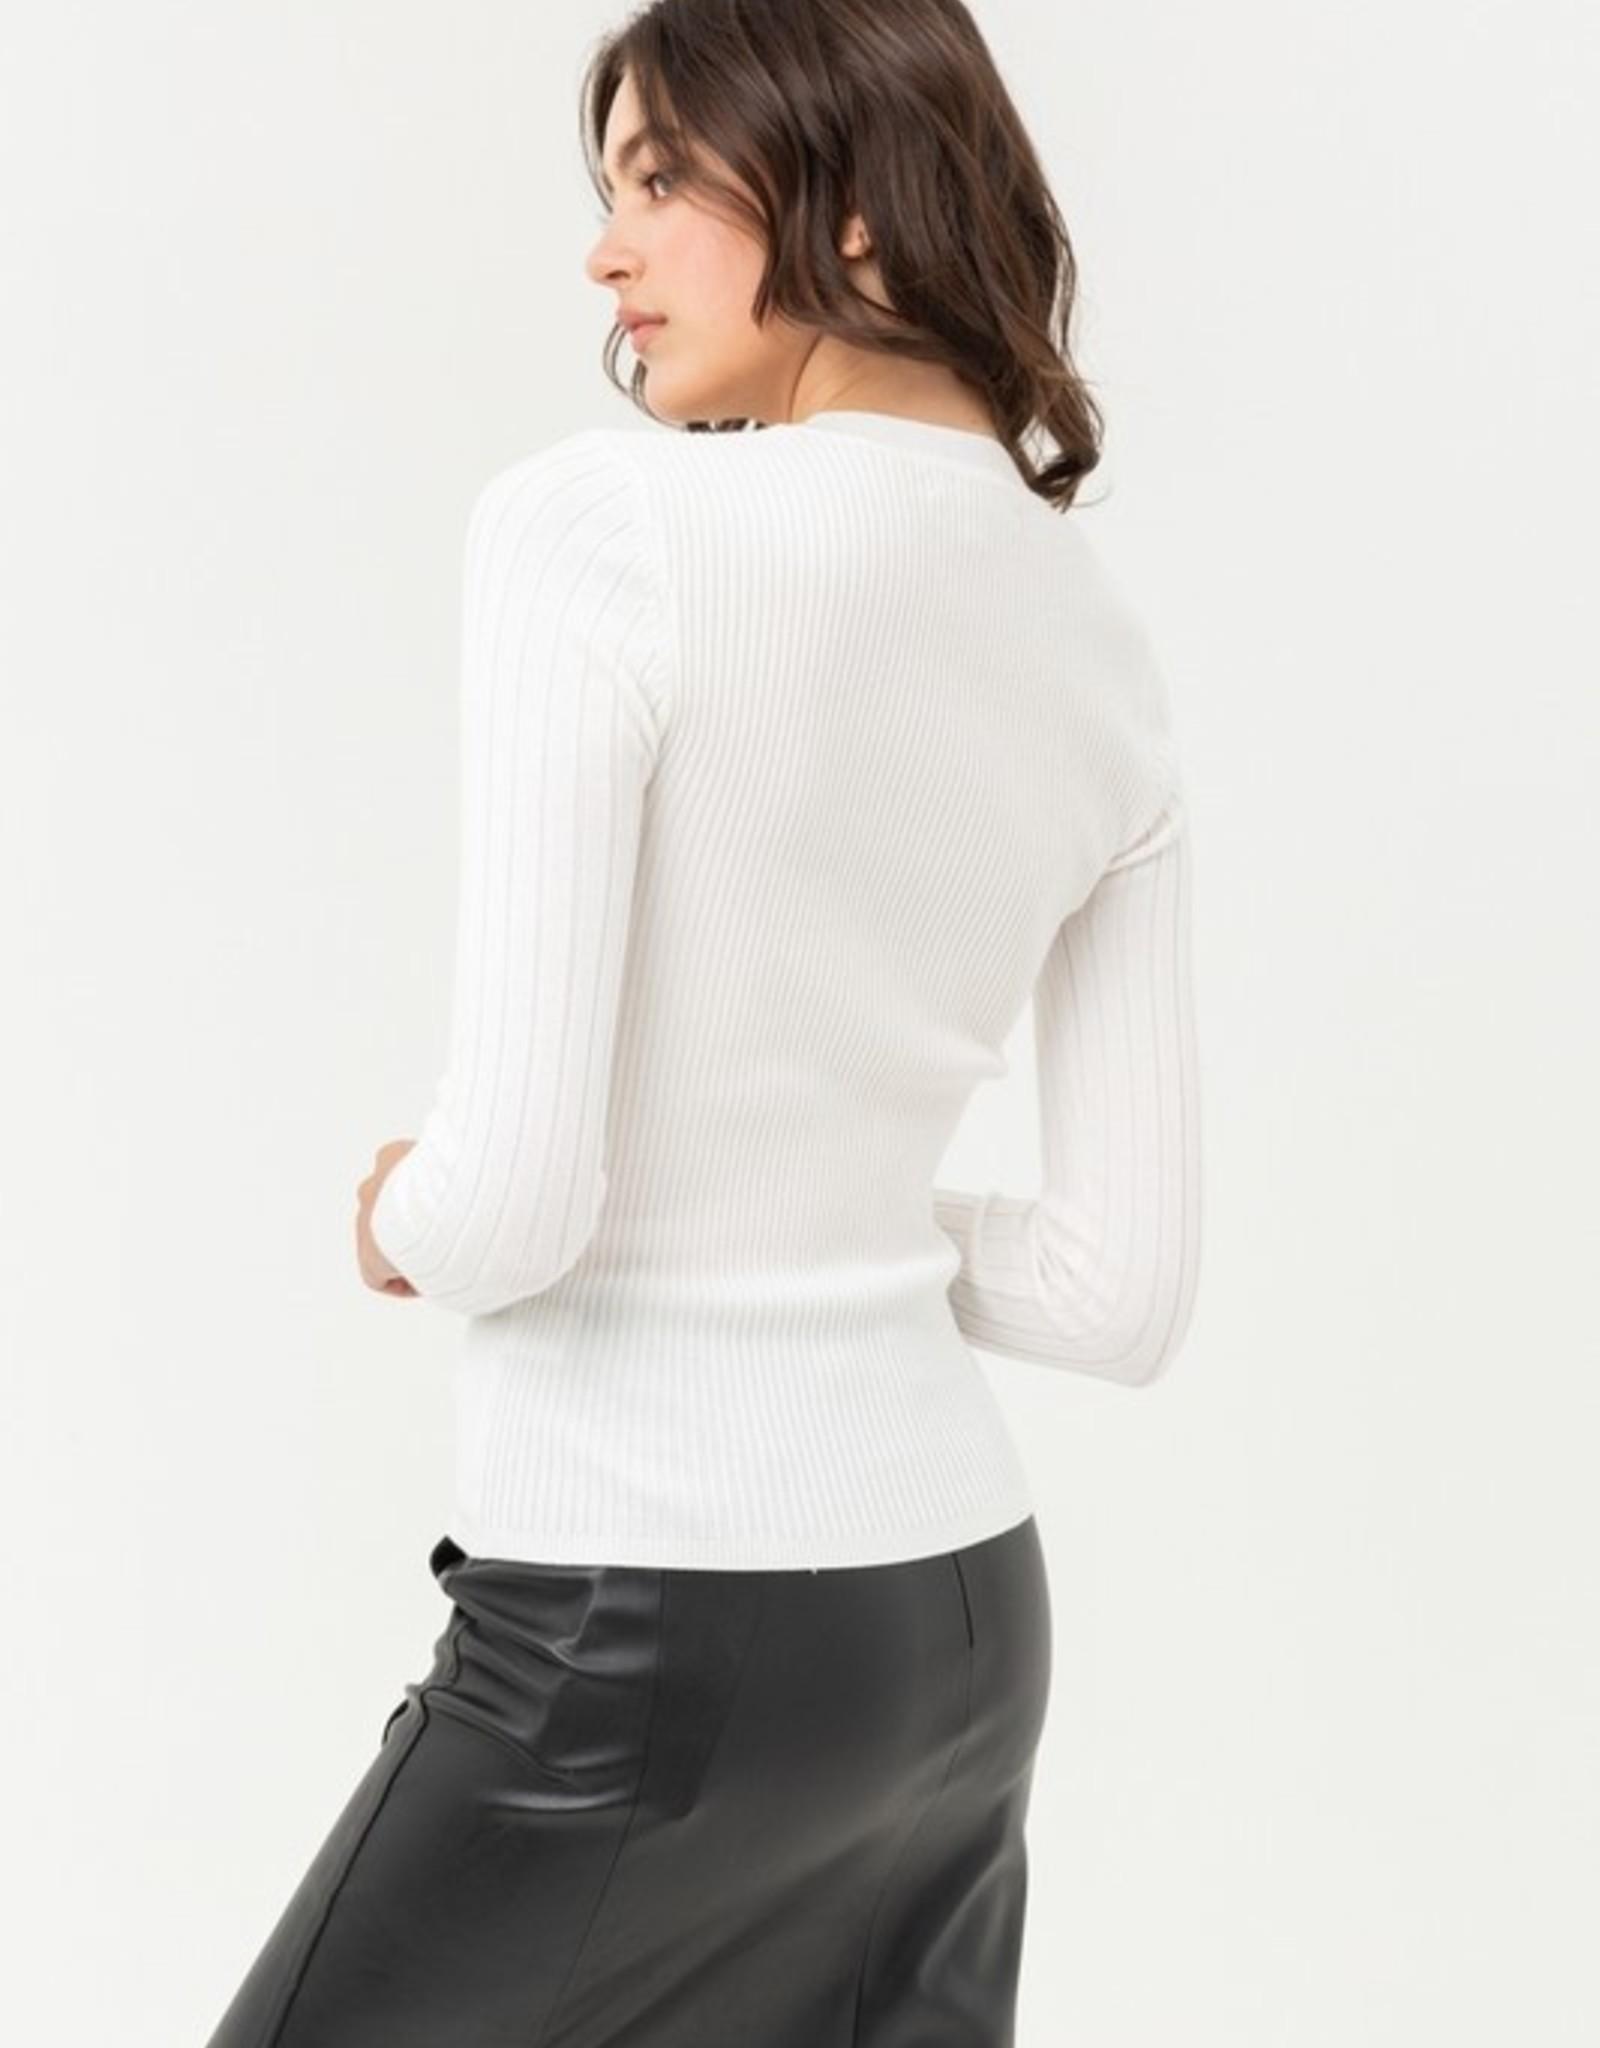 Ribbed long sleeve top